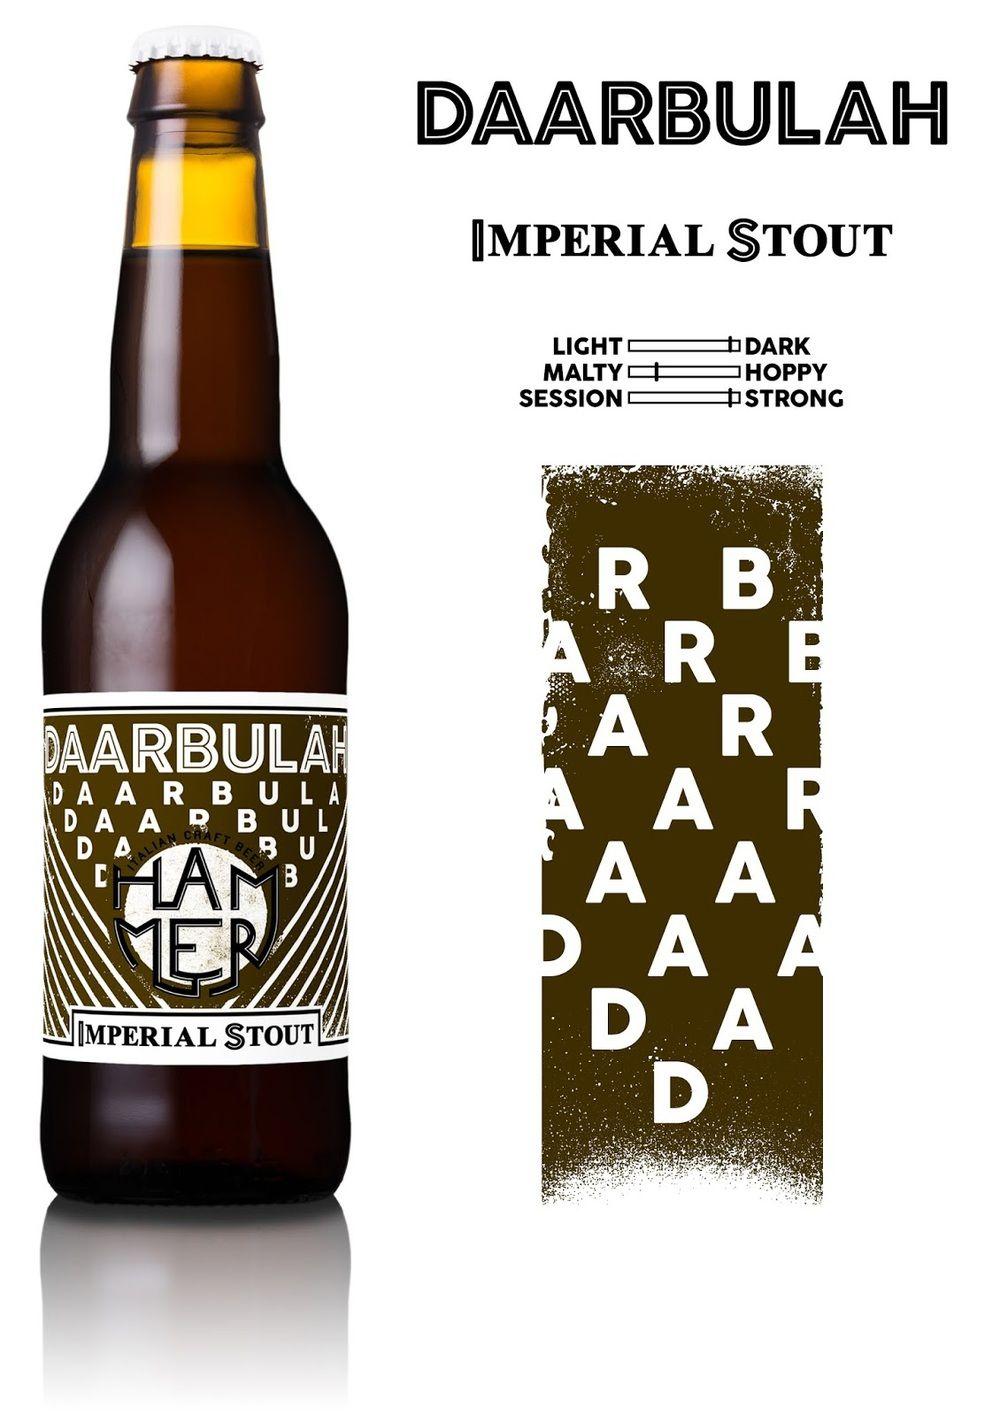 08_DAARBULAH_imperial-stout.jpg